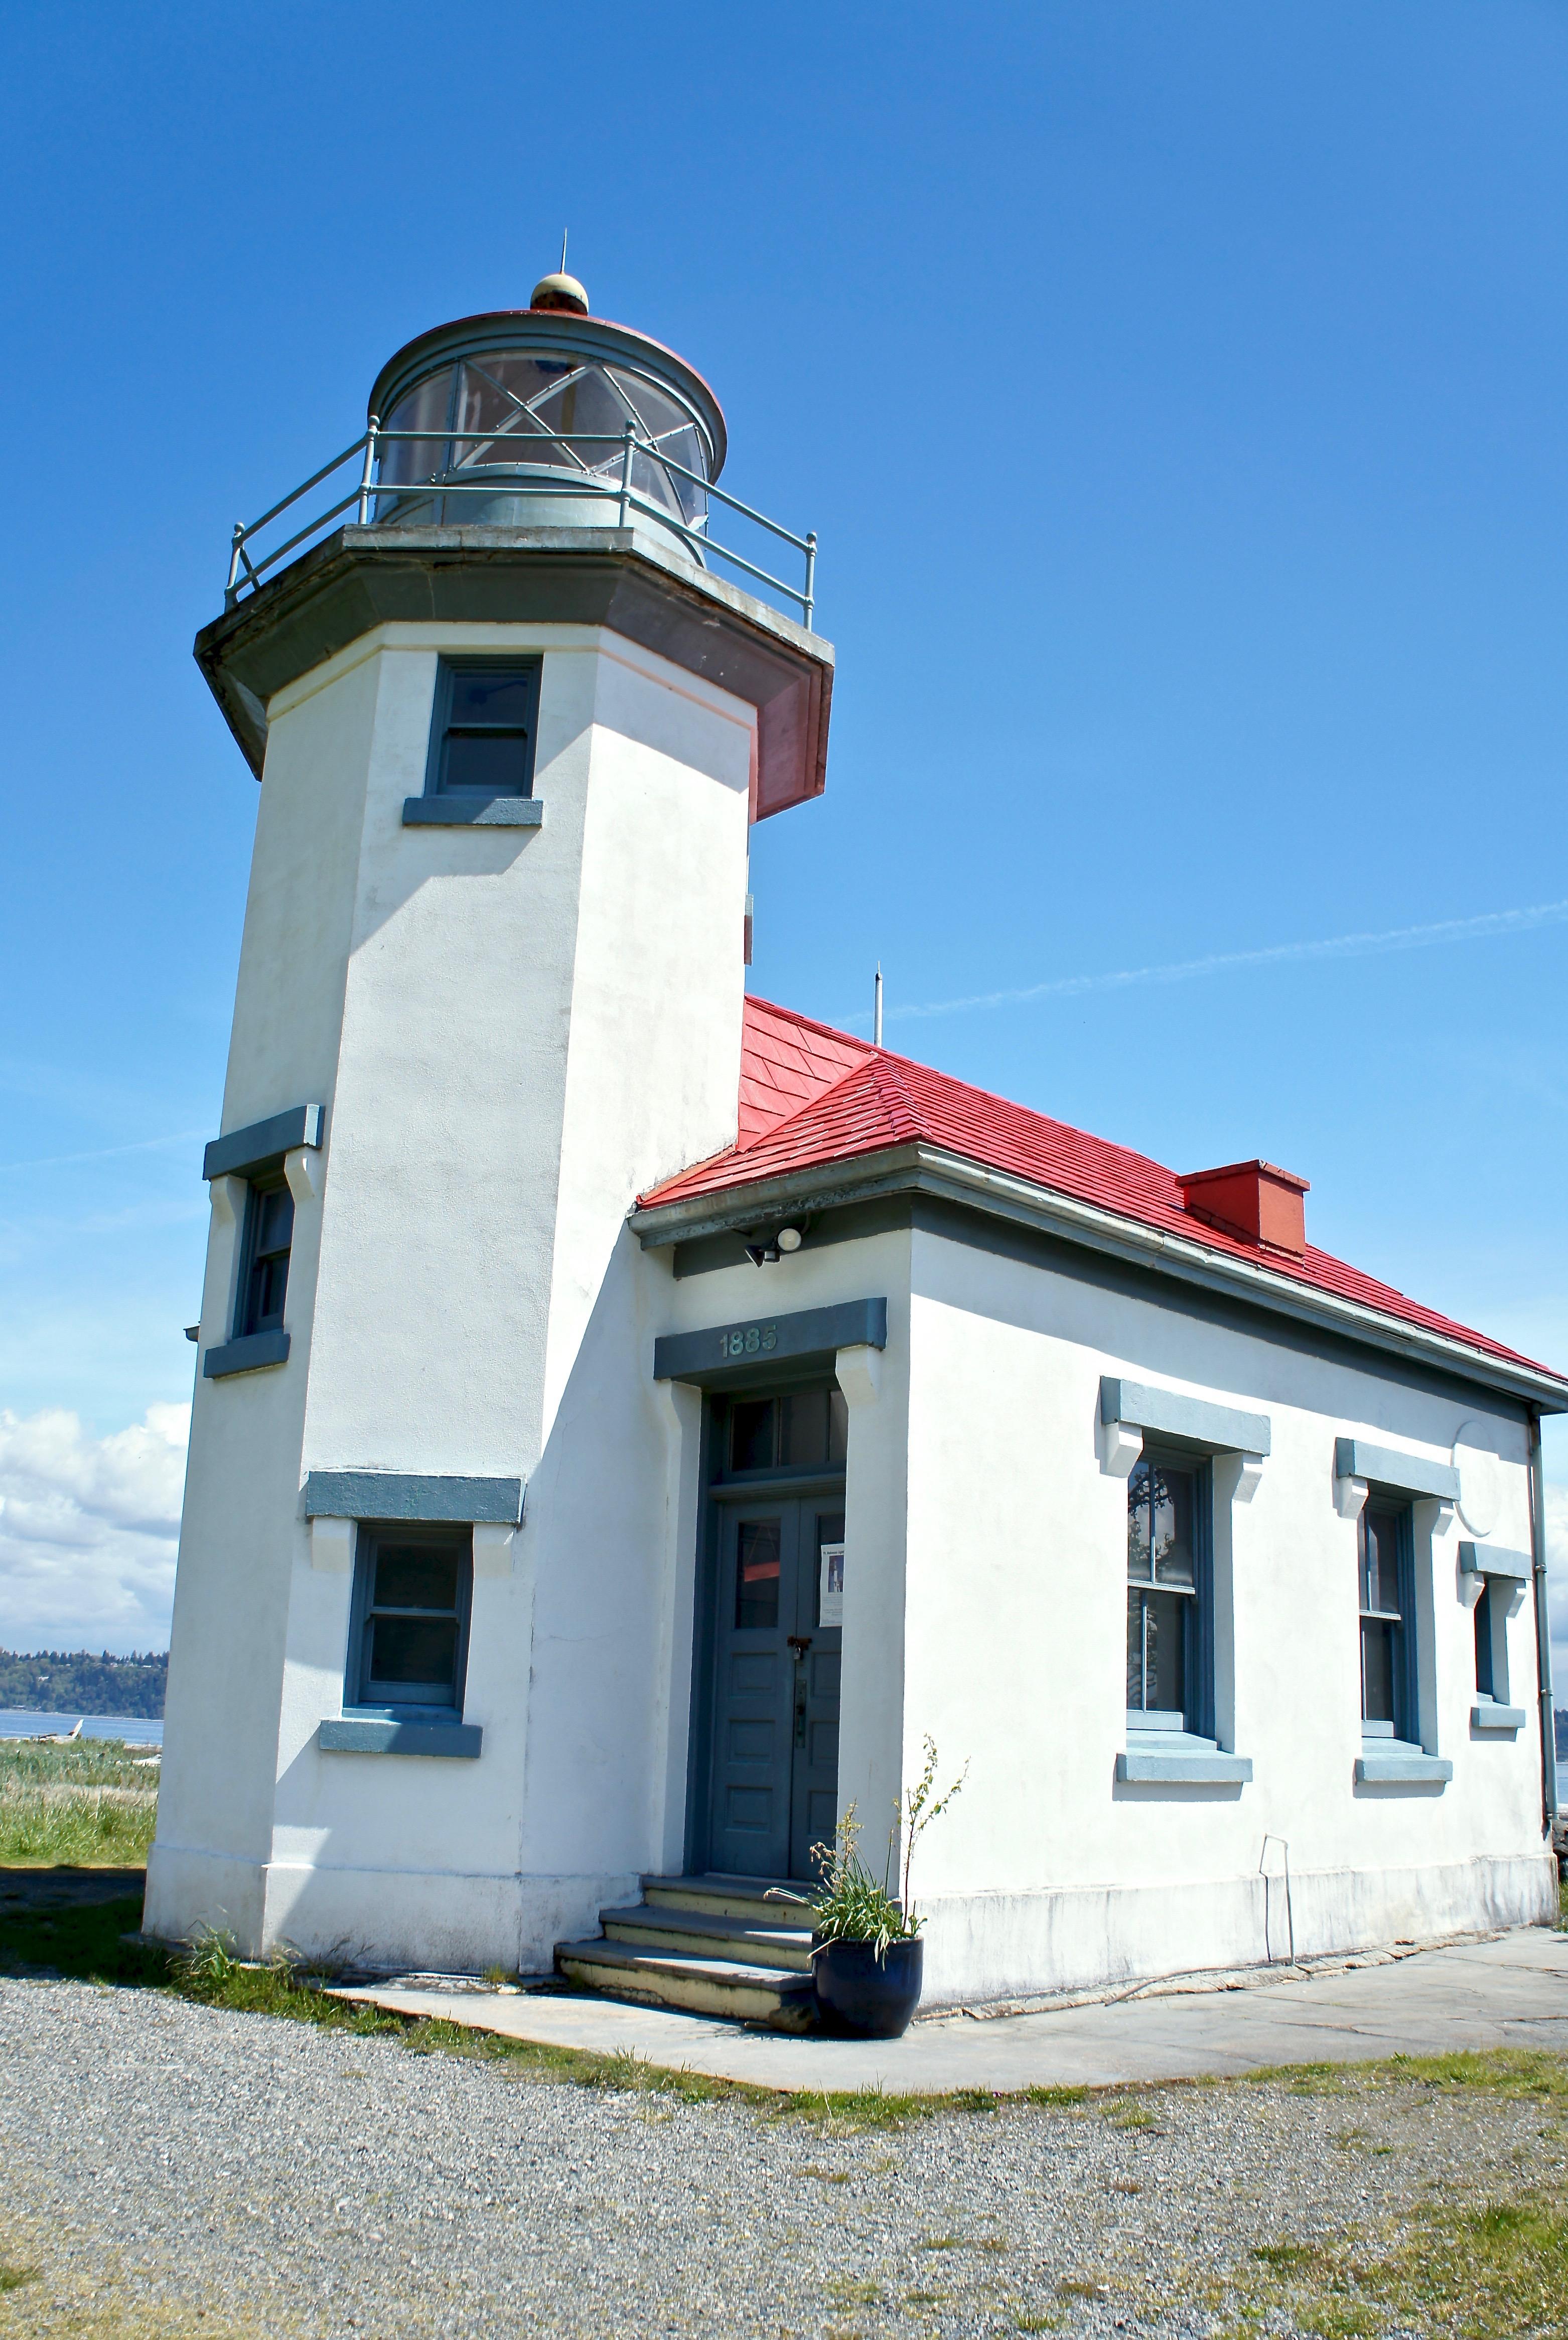 Vashon Island | kaleandcompass.com